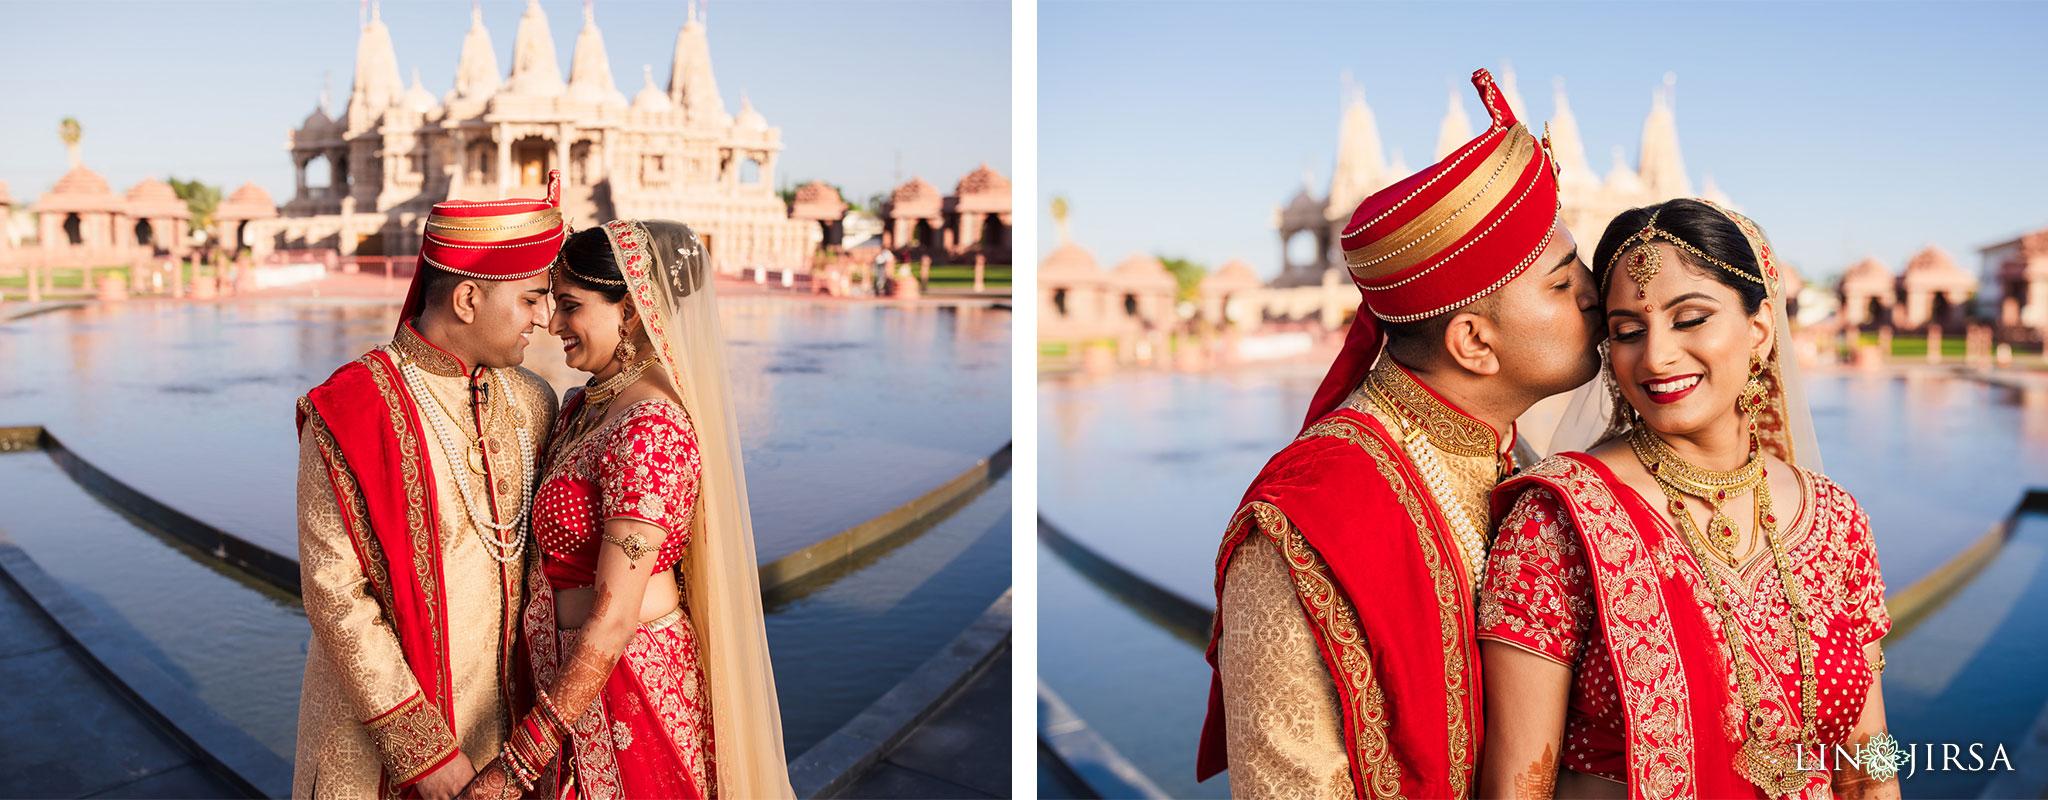 075 Swaminarayan Mandir Los Angeles County Indian Wedding Photography